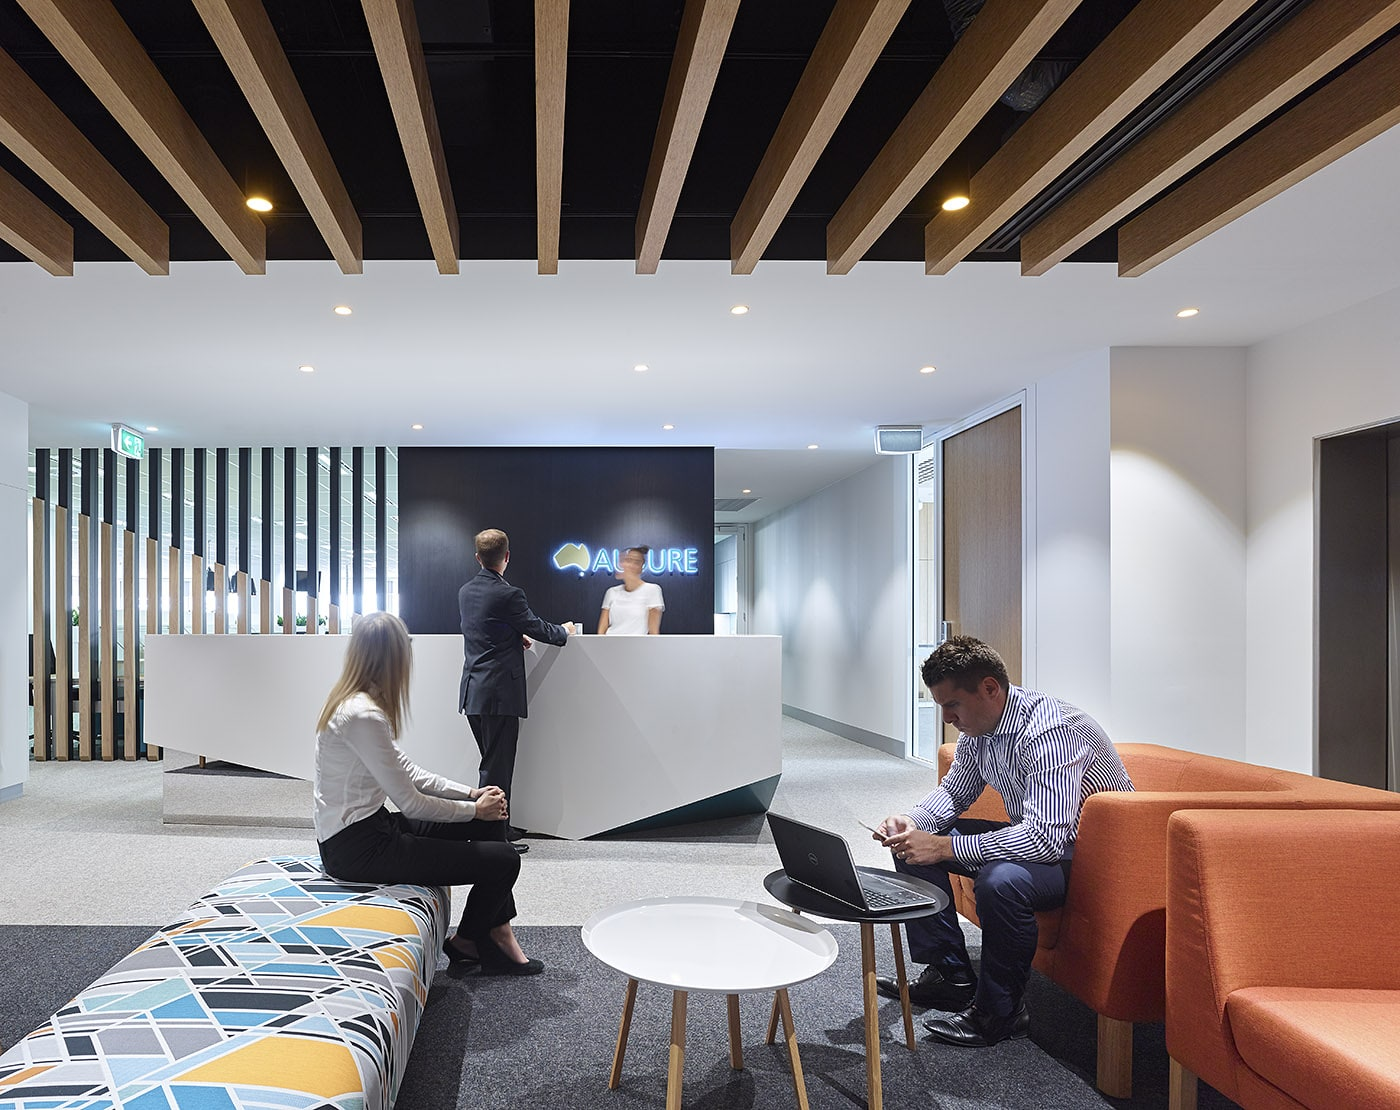 Ausure Brisbane Tenant Representation, Interior Design, Project & Construction Management Project Banner Image  by PCG